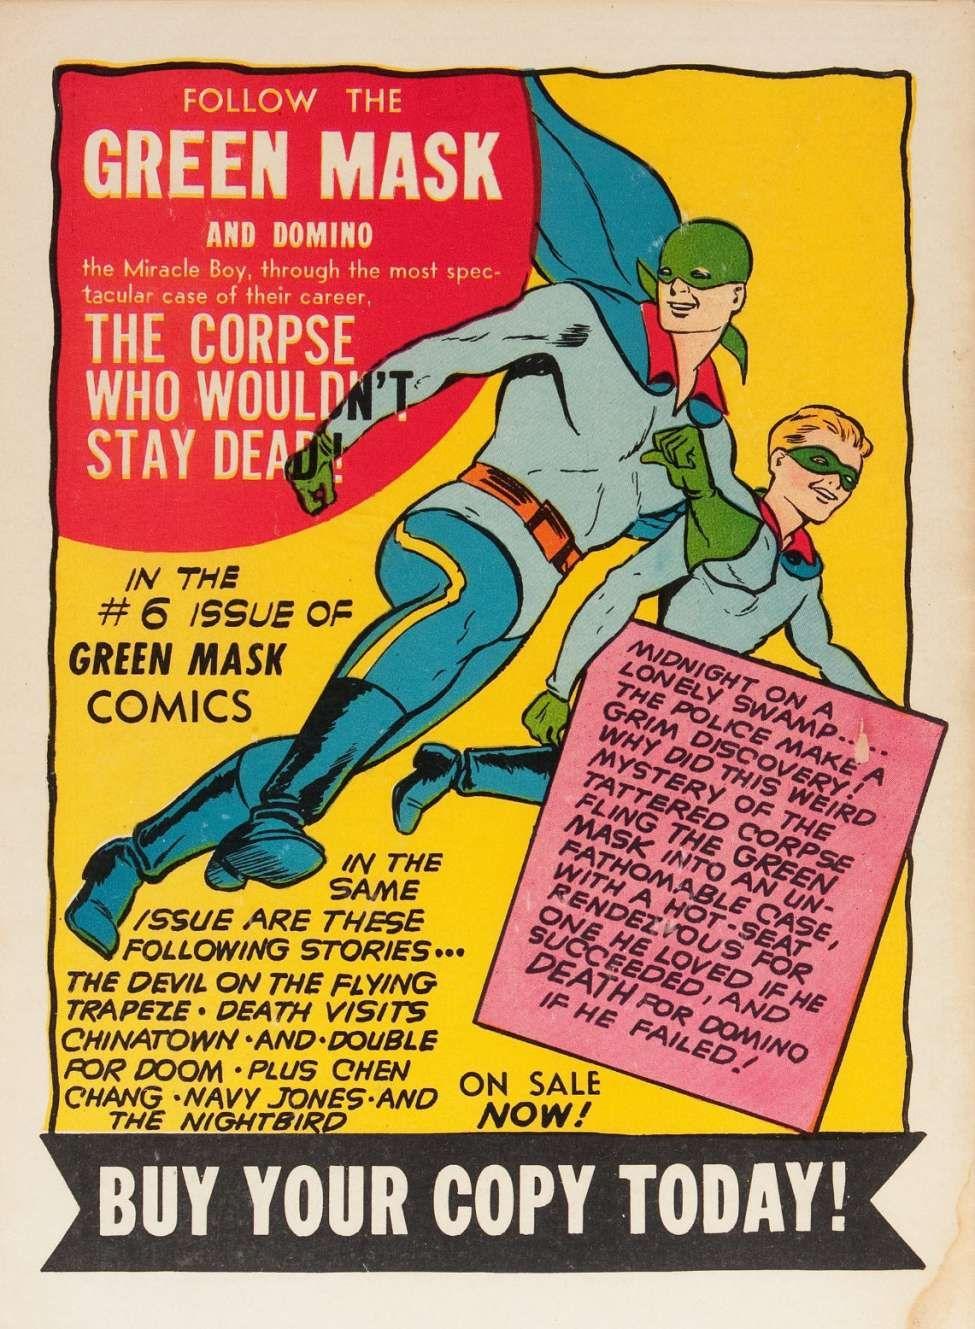 Charlton Comics Image By Winstonsboogie On Charlton Comics Fiction